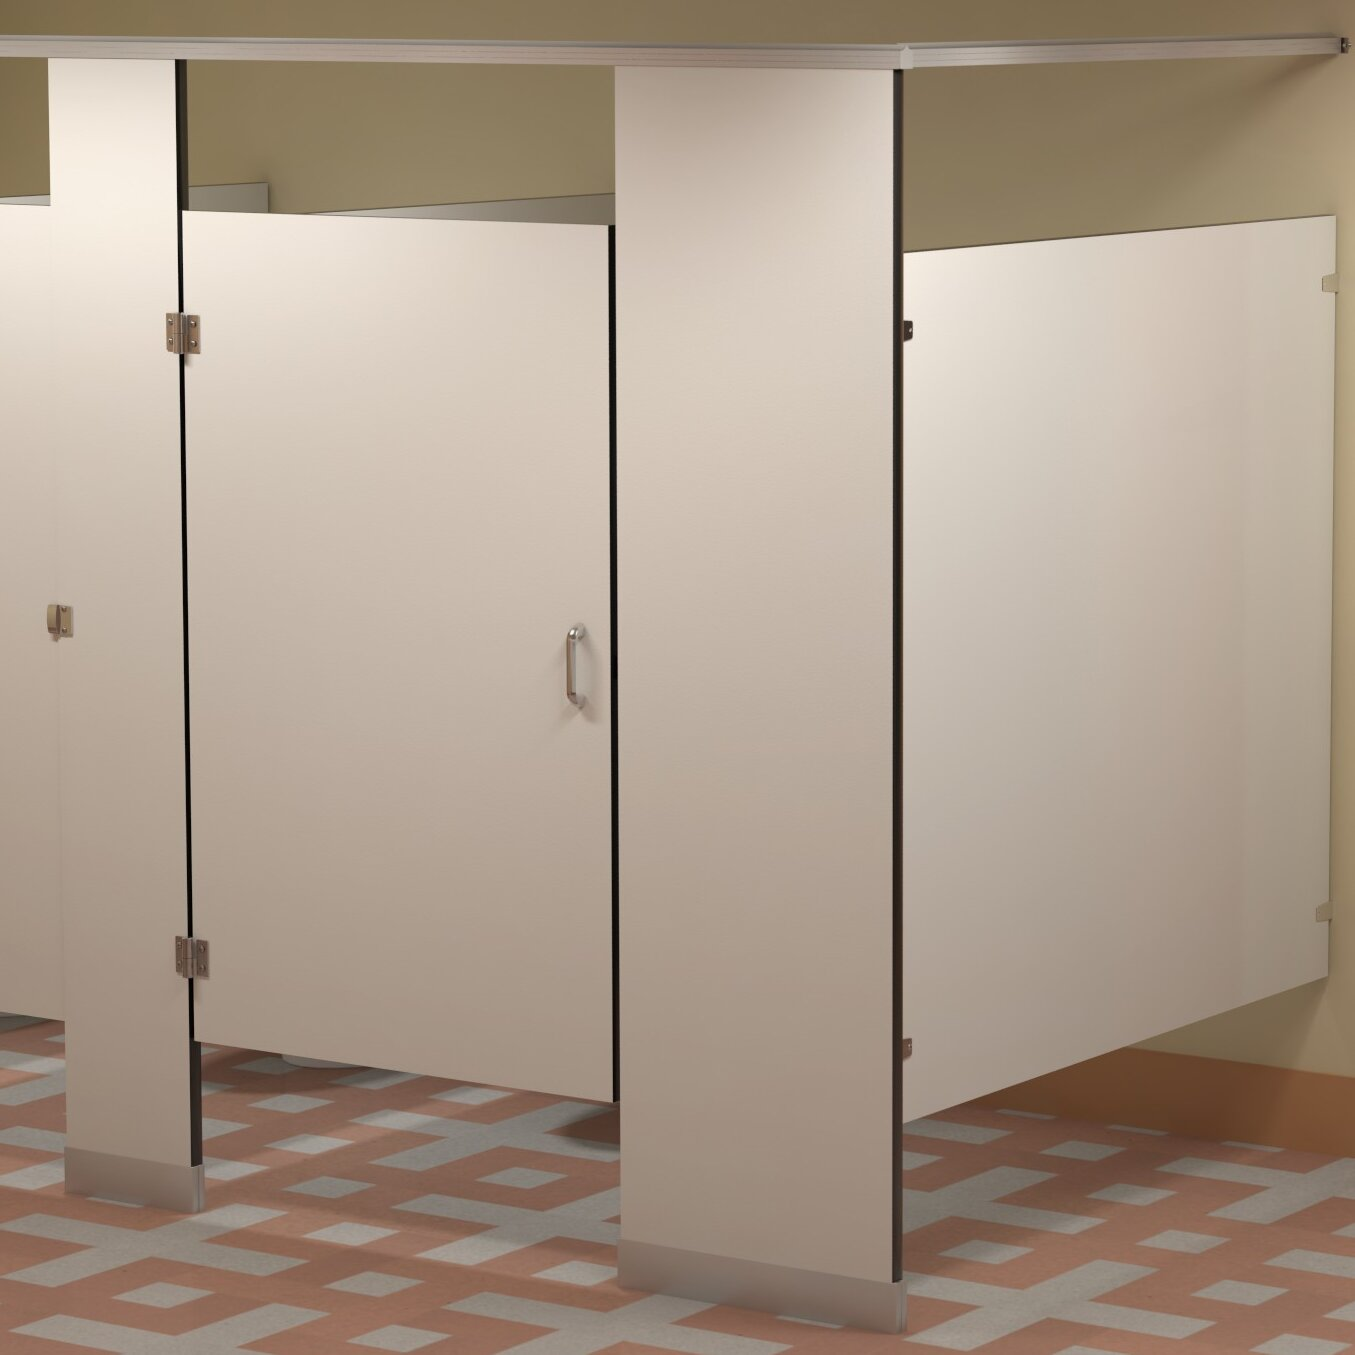 Bradley Corporation Replacement Solid Phenolic Core Overhead Braced Toilet Partition Wayfair